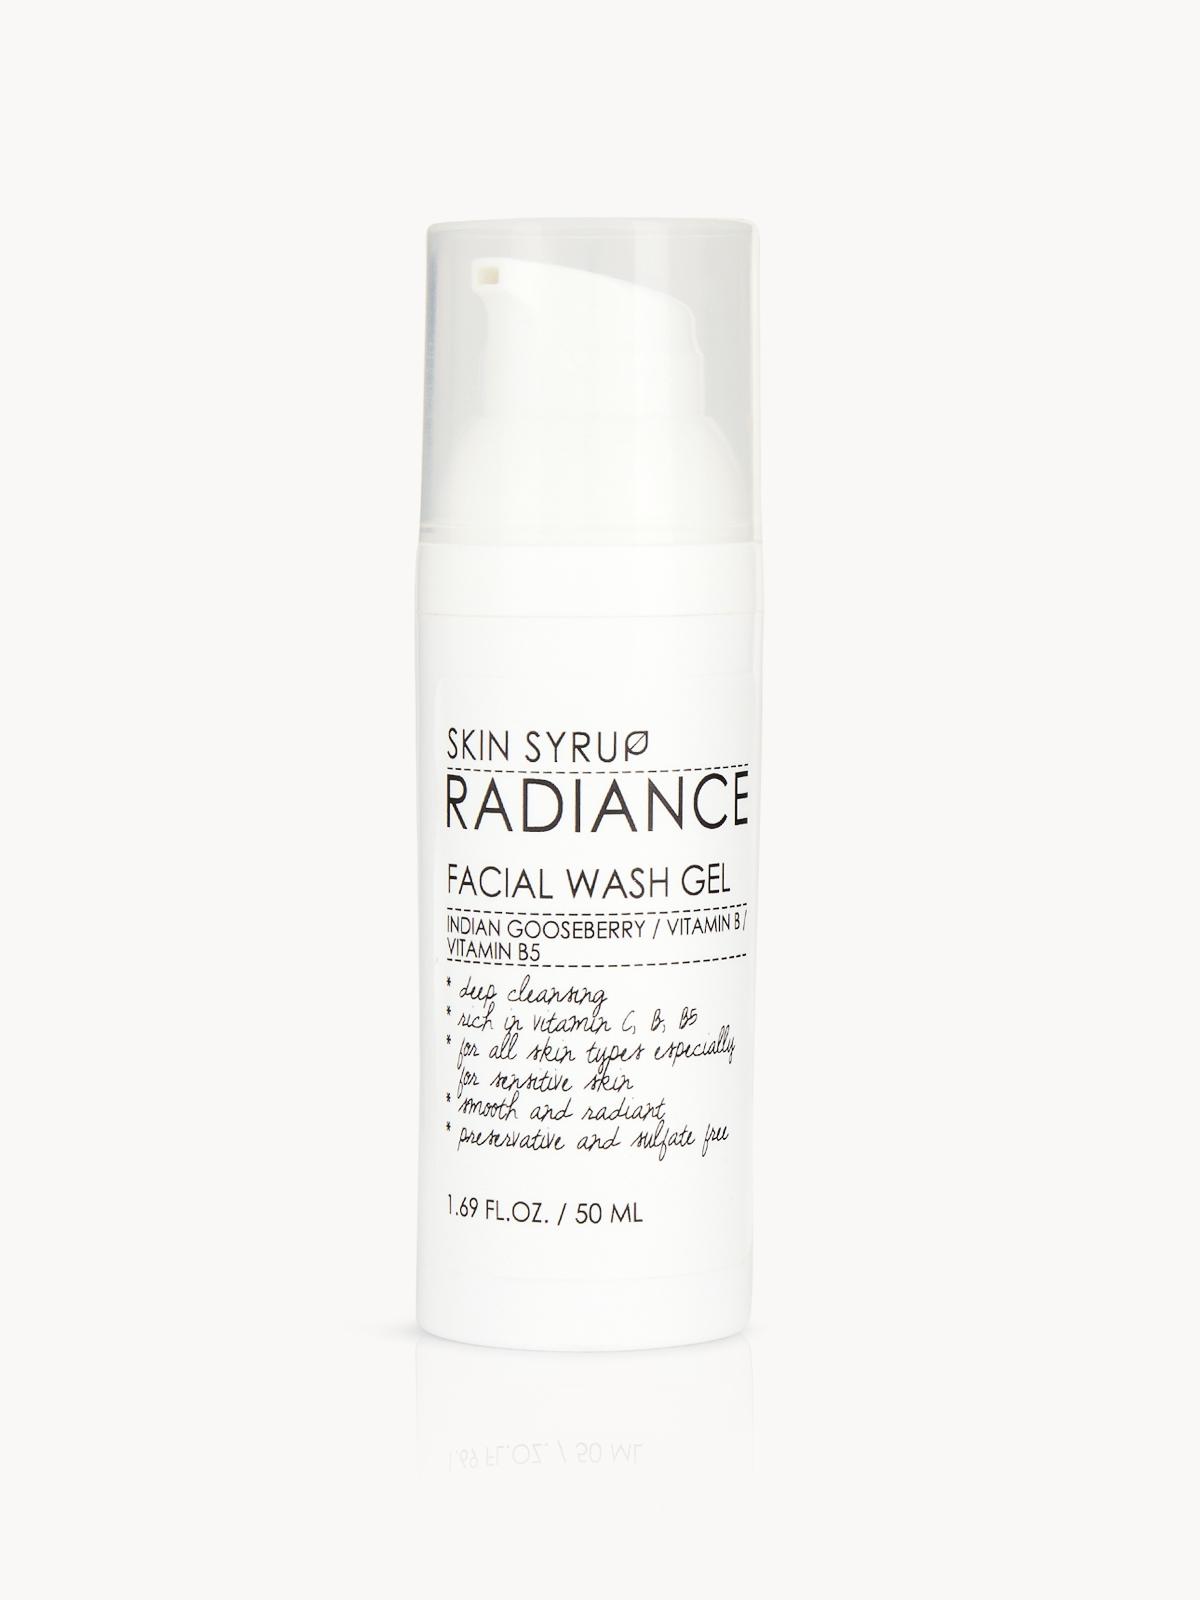 Skin Syrup Radiance Facial Wash Gel